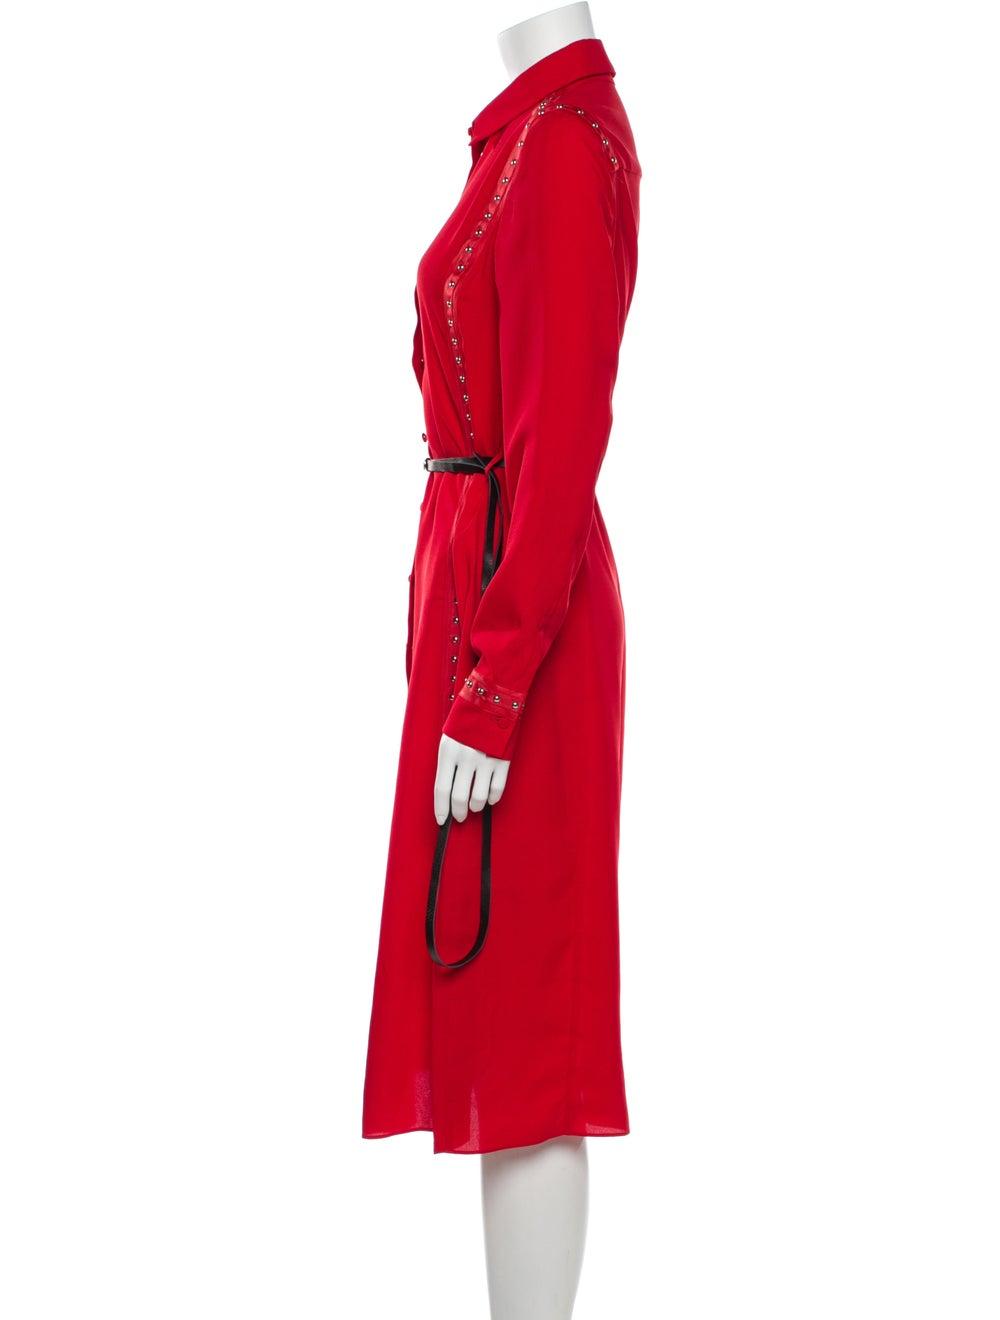 Altuzarra Midi Length Dress Red - image 2